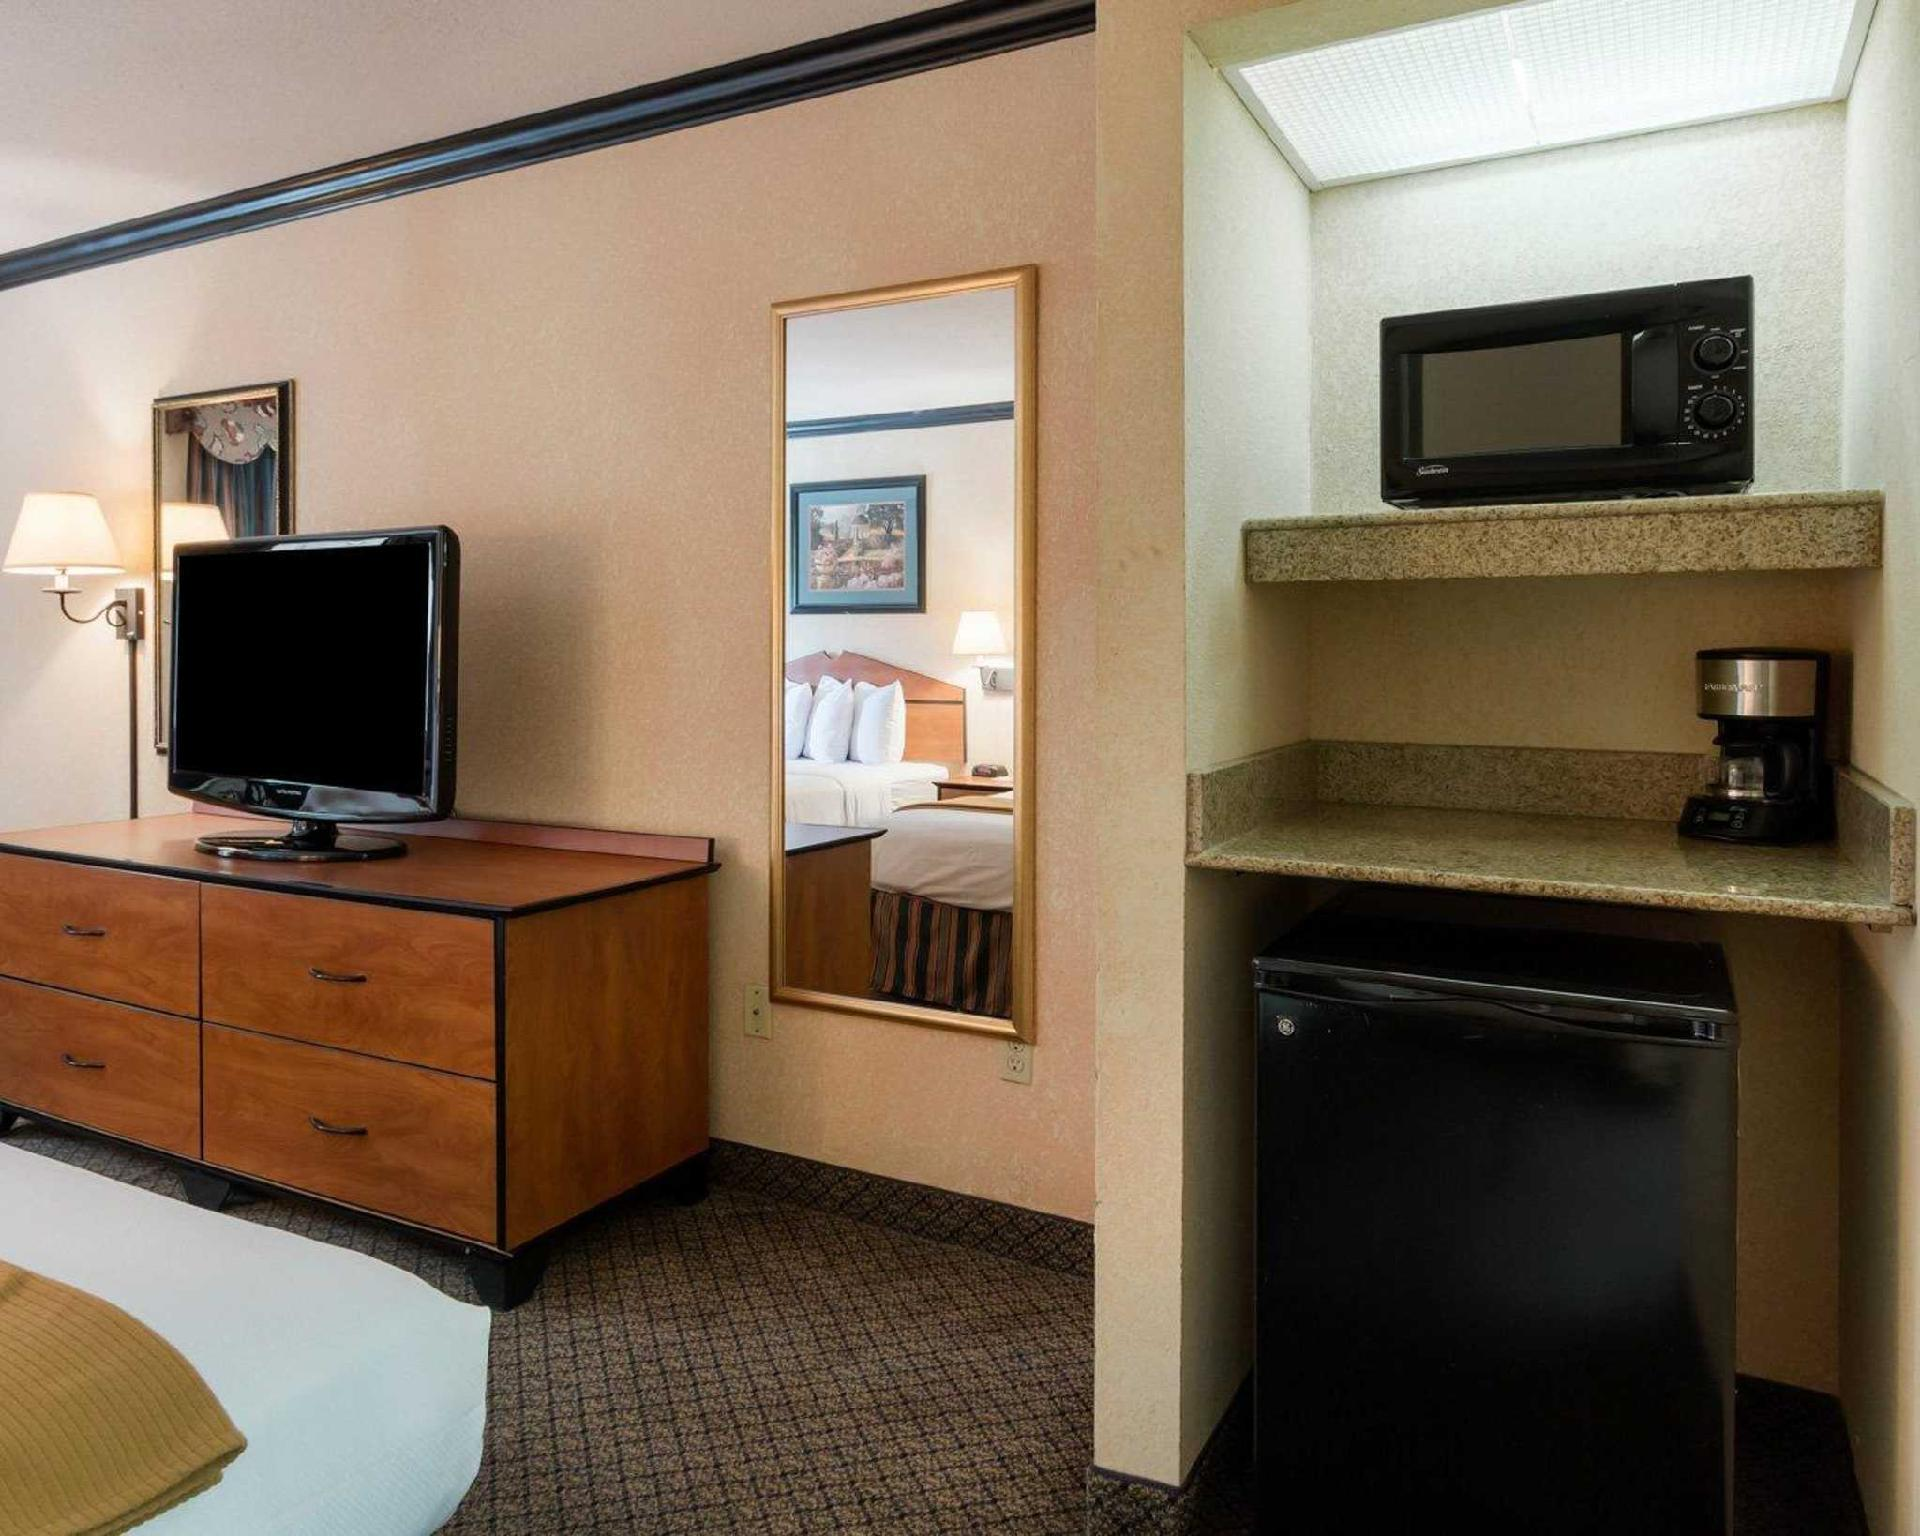 Quality Inn & Suites, Angelina